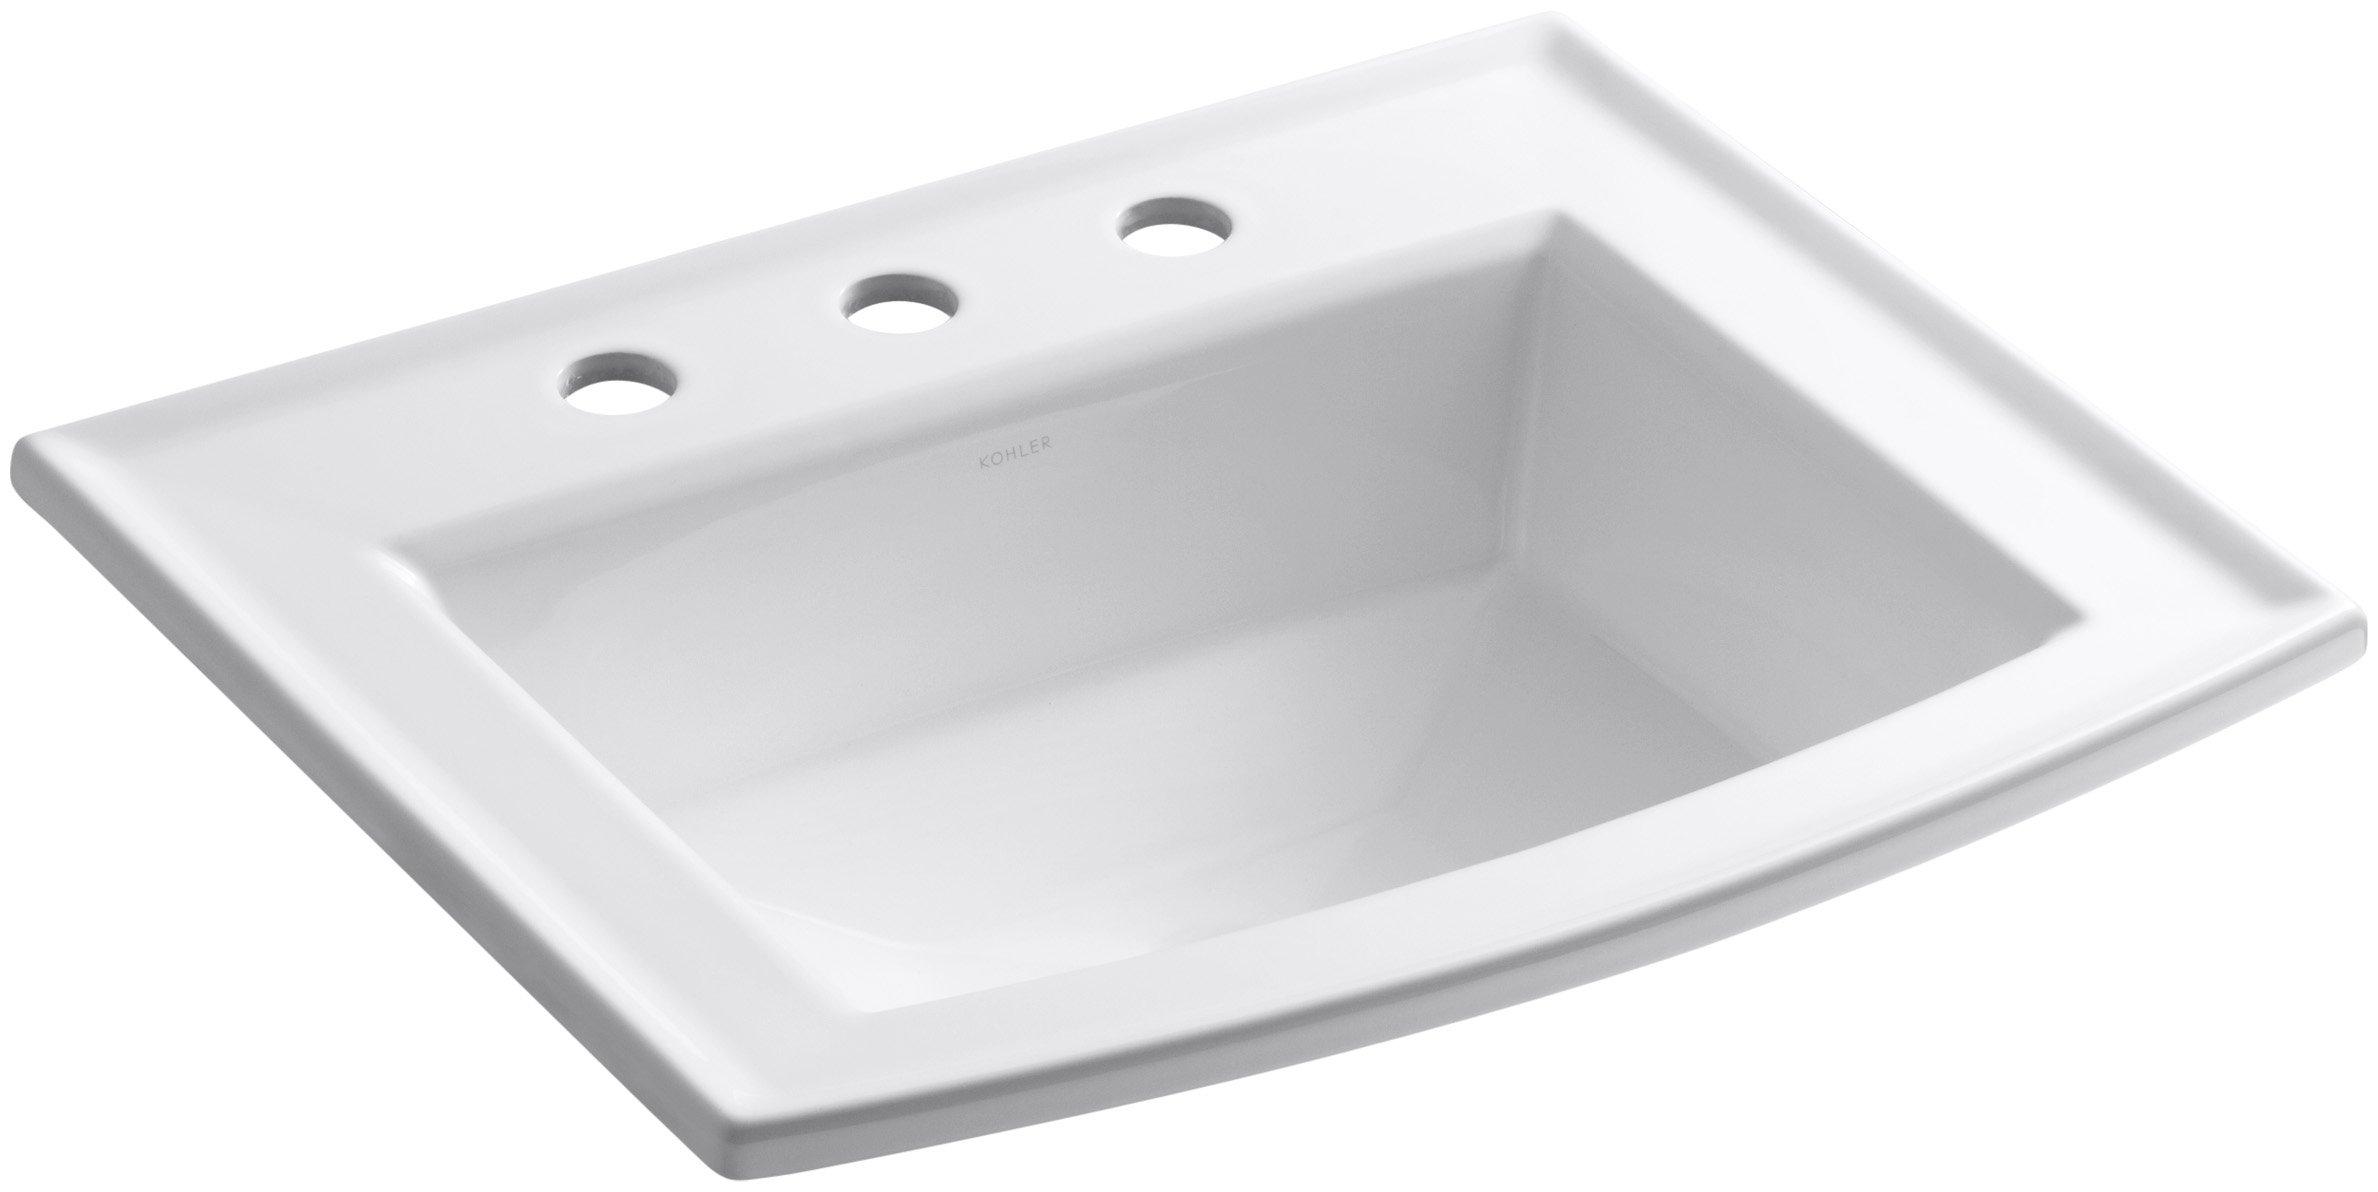 KOHLER K-2356-8-0 Archer Self-rimming Bathroom Sink with 8-Inch Centers, White by Kohler